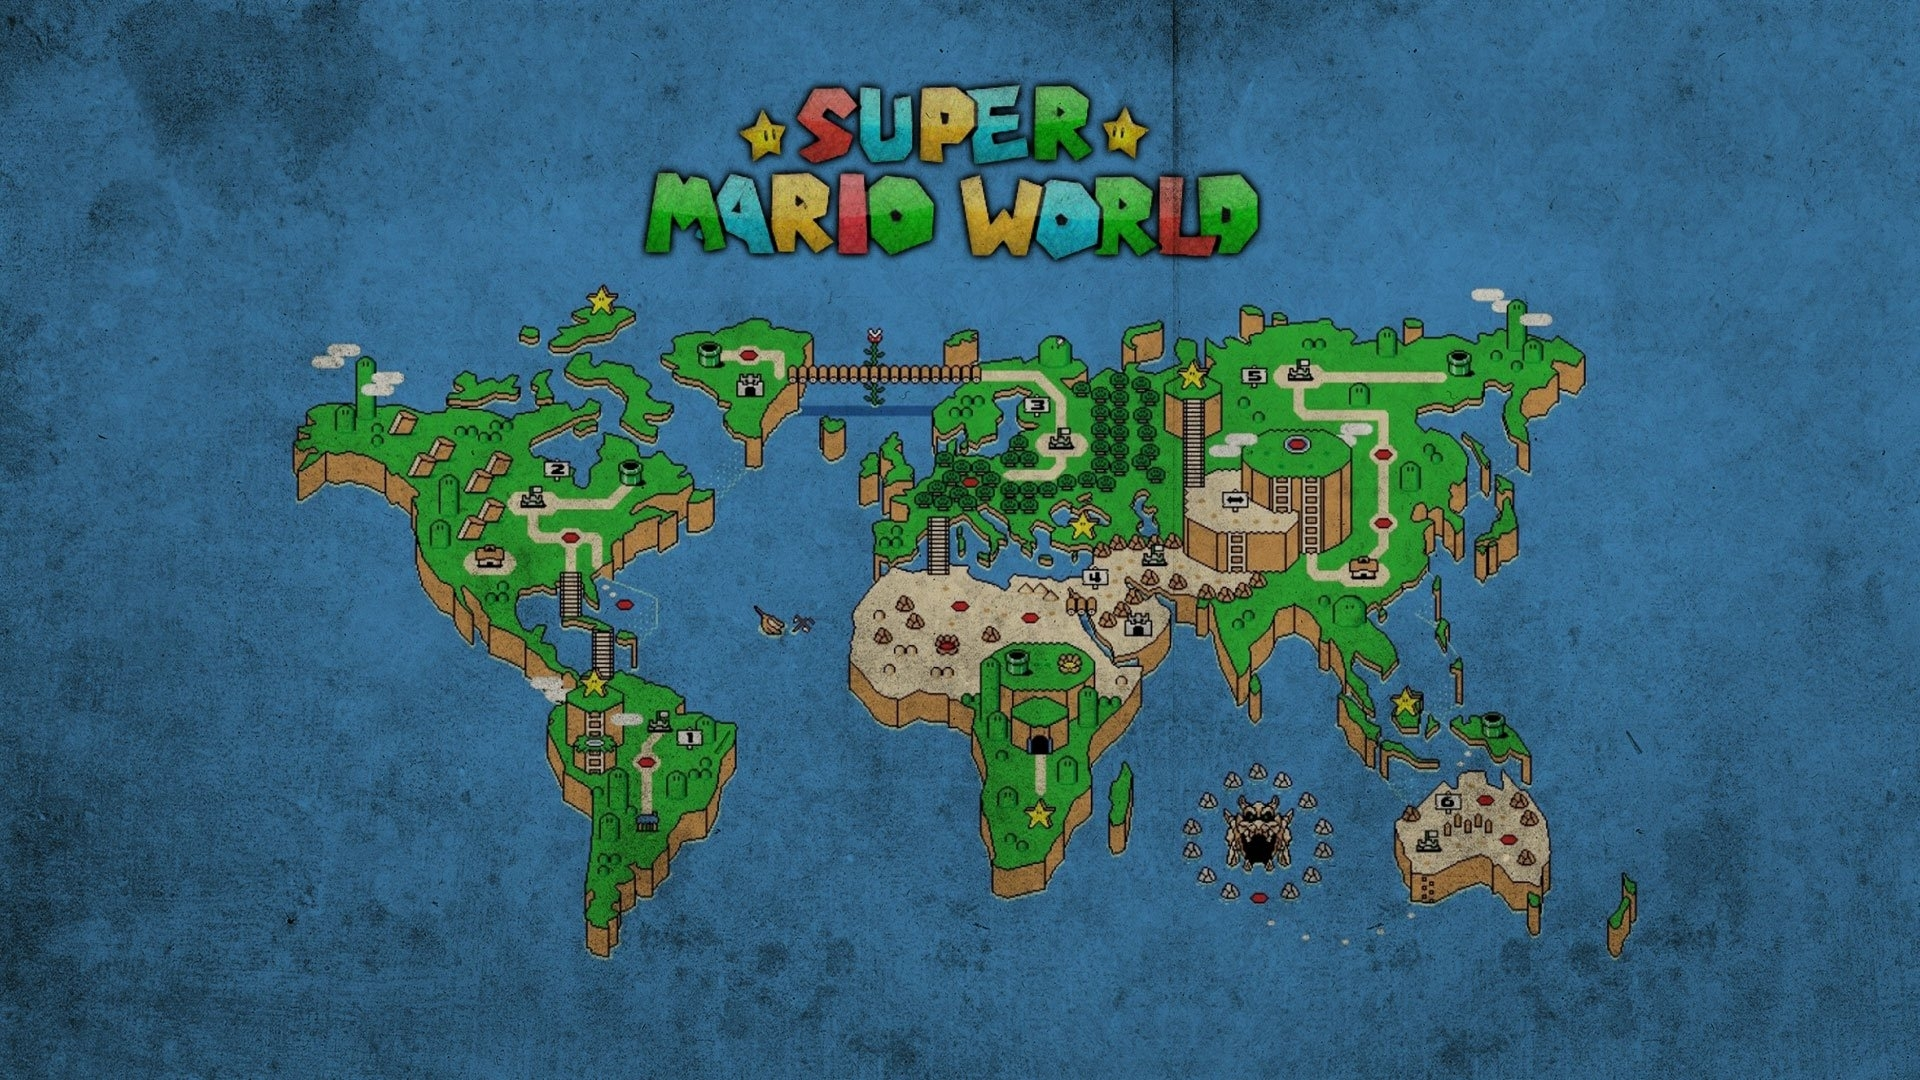 super mario world map 733863 - walldevil